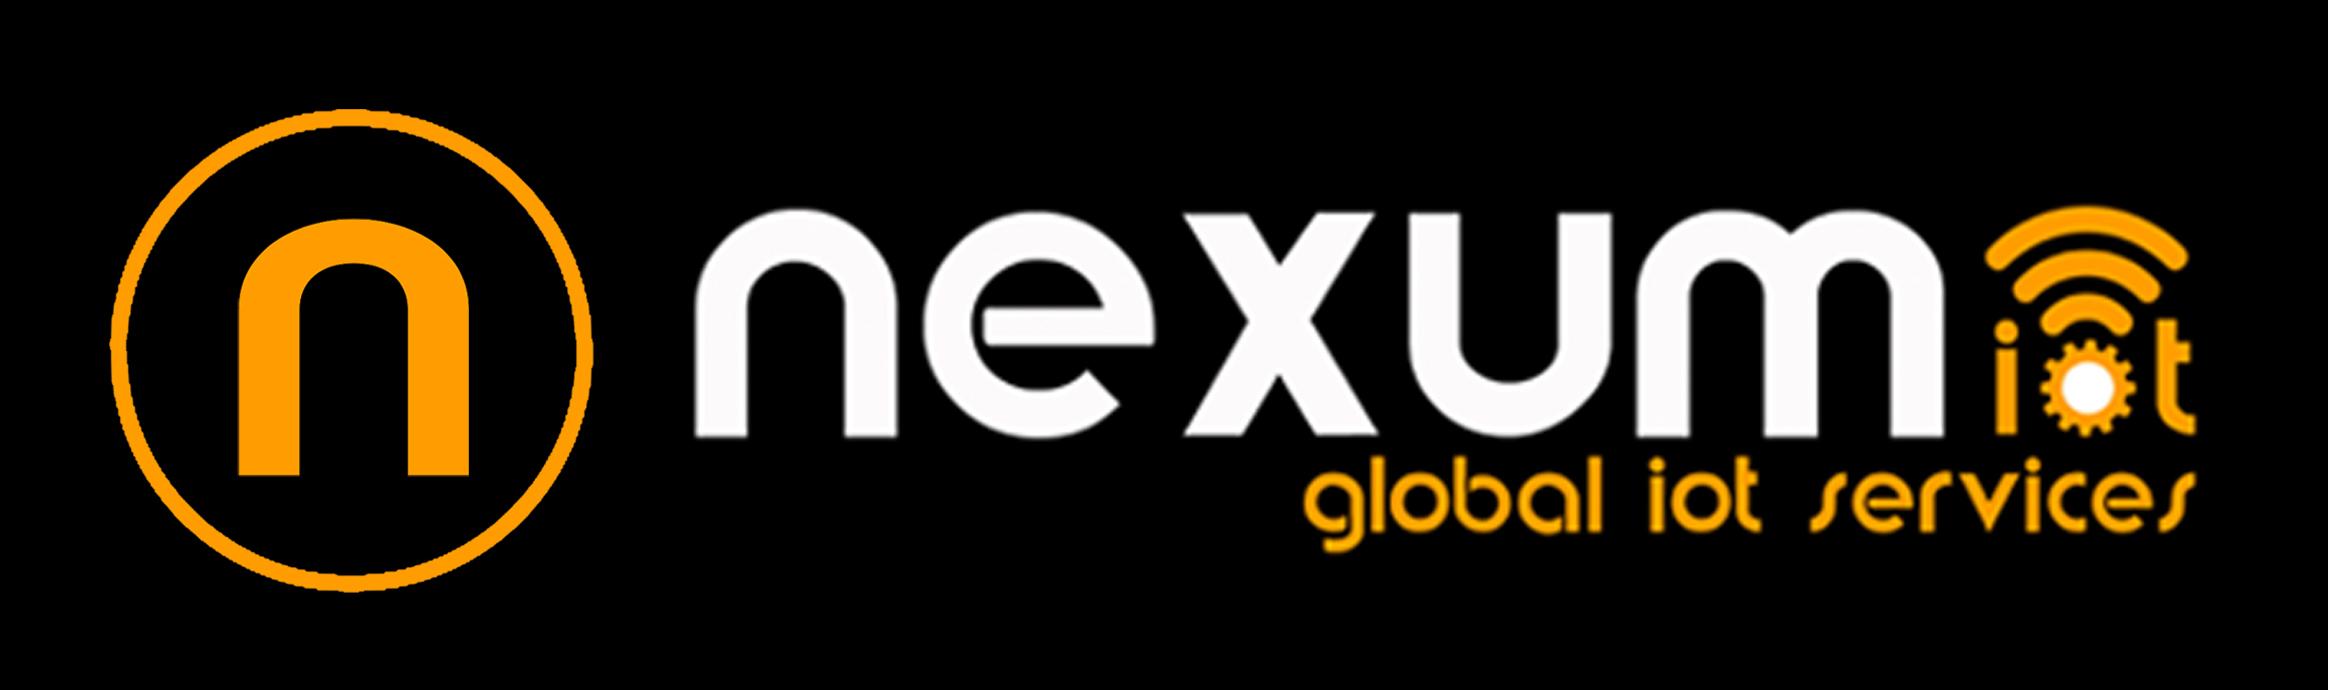 Nexum-IoT Services S.L.